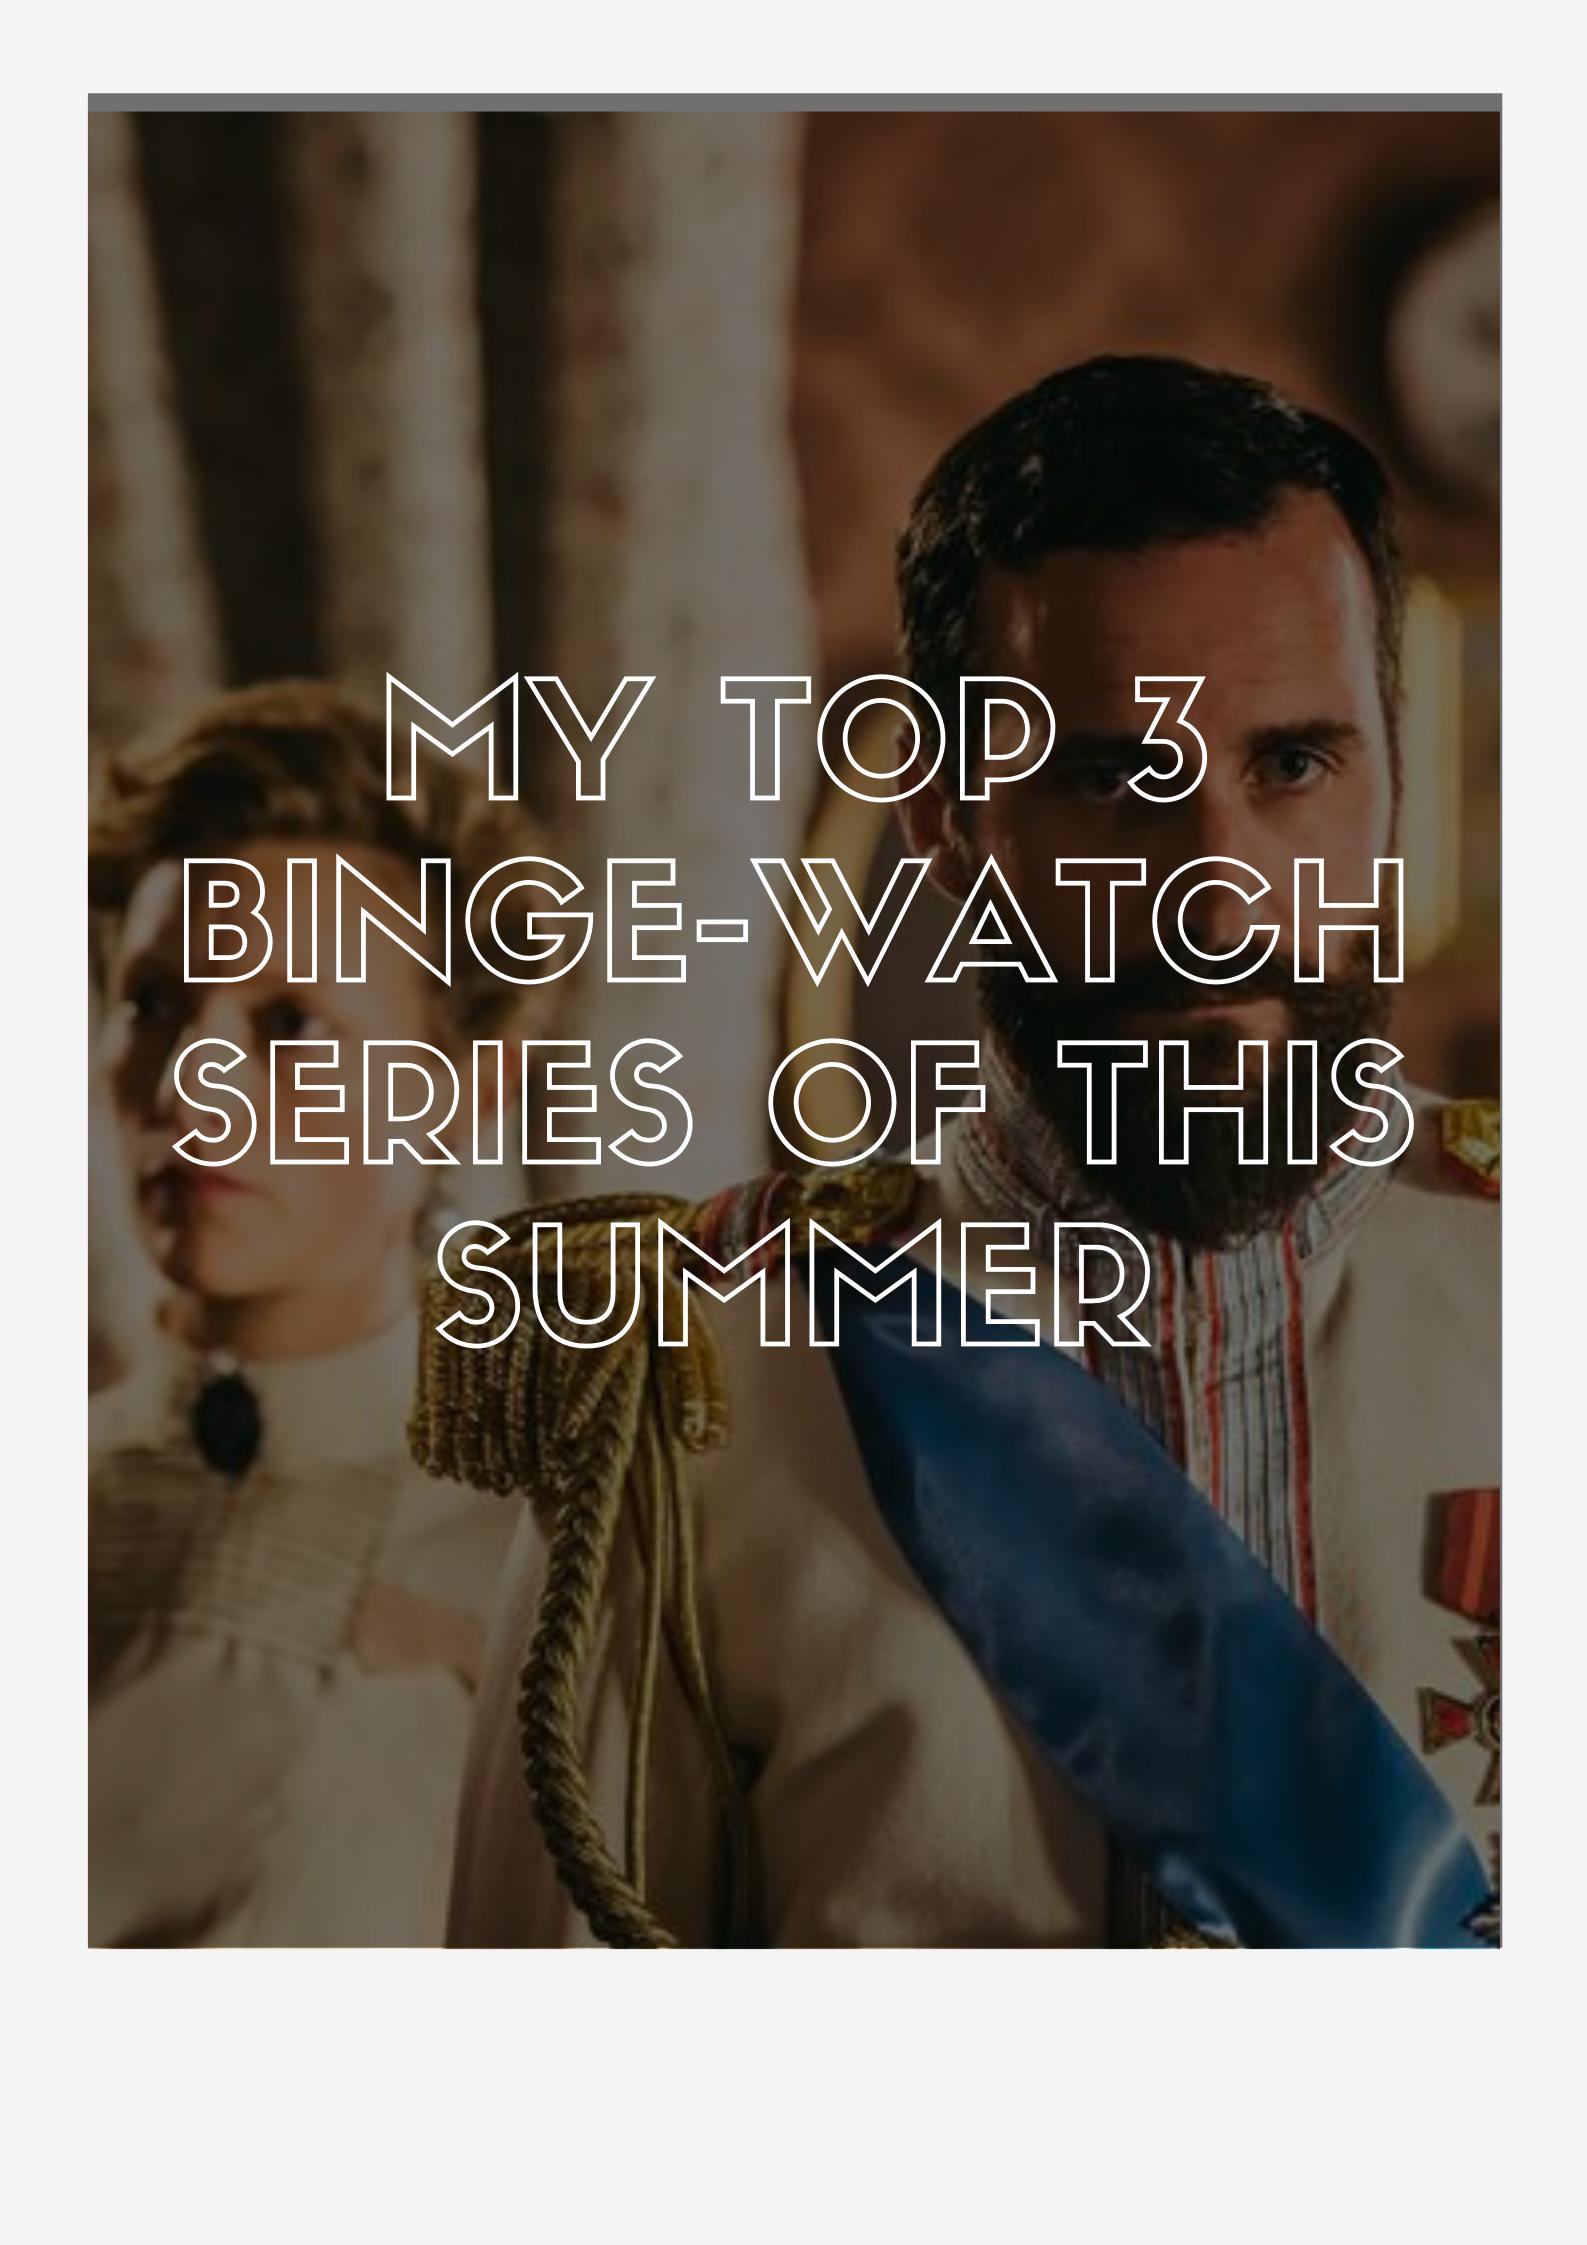 My Top 3 Binge-Watch Series of Summer 2020